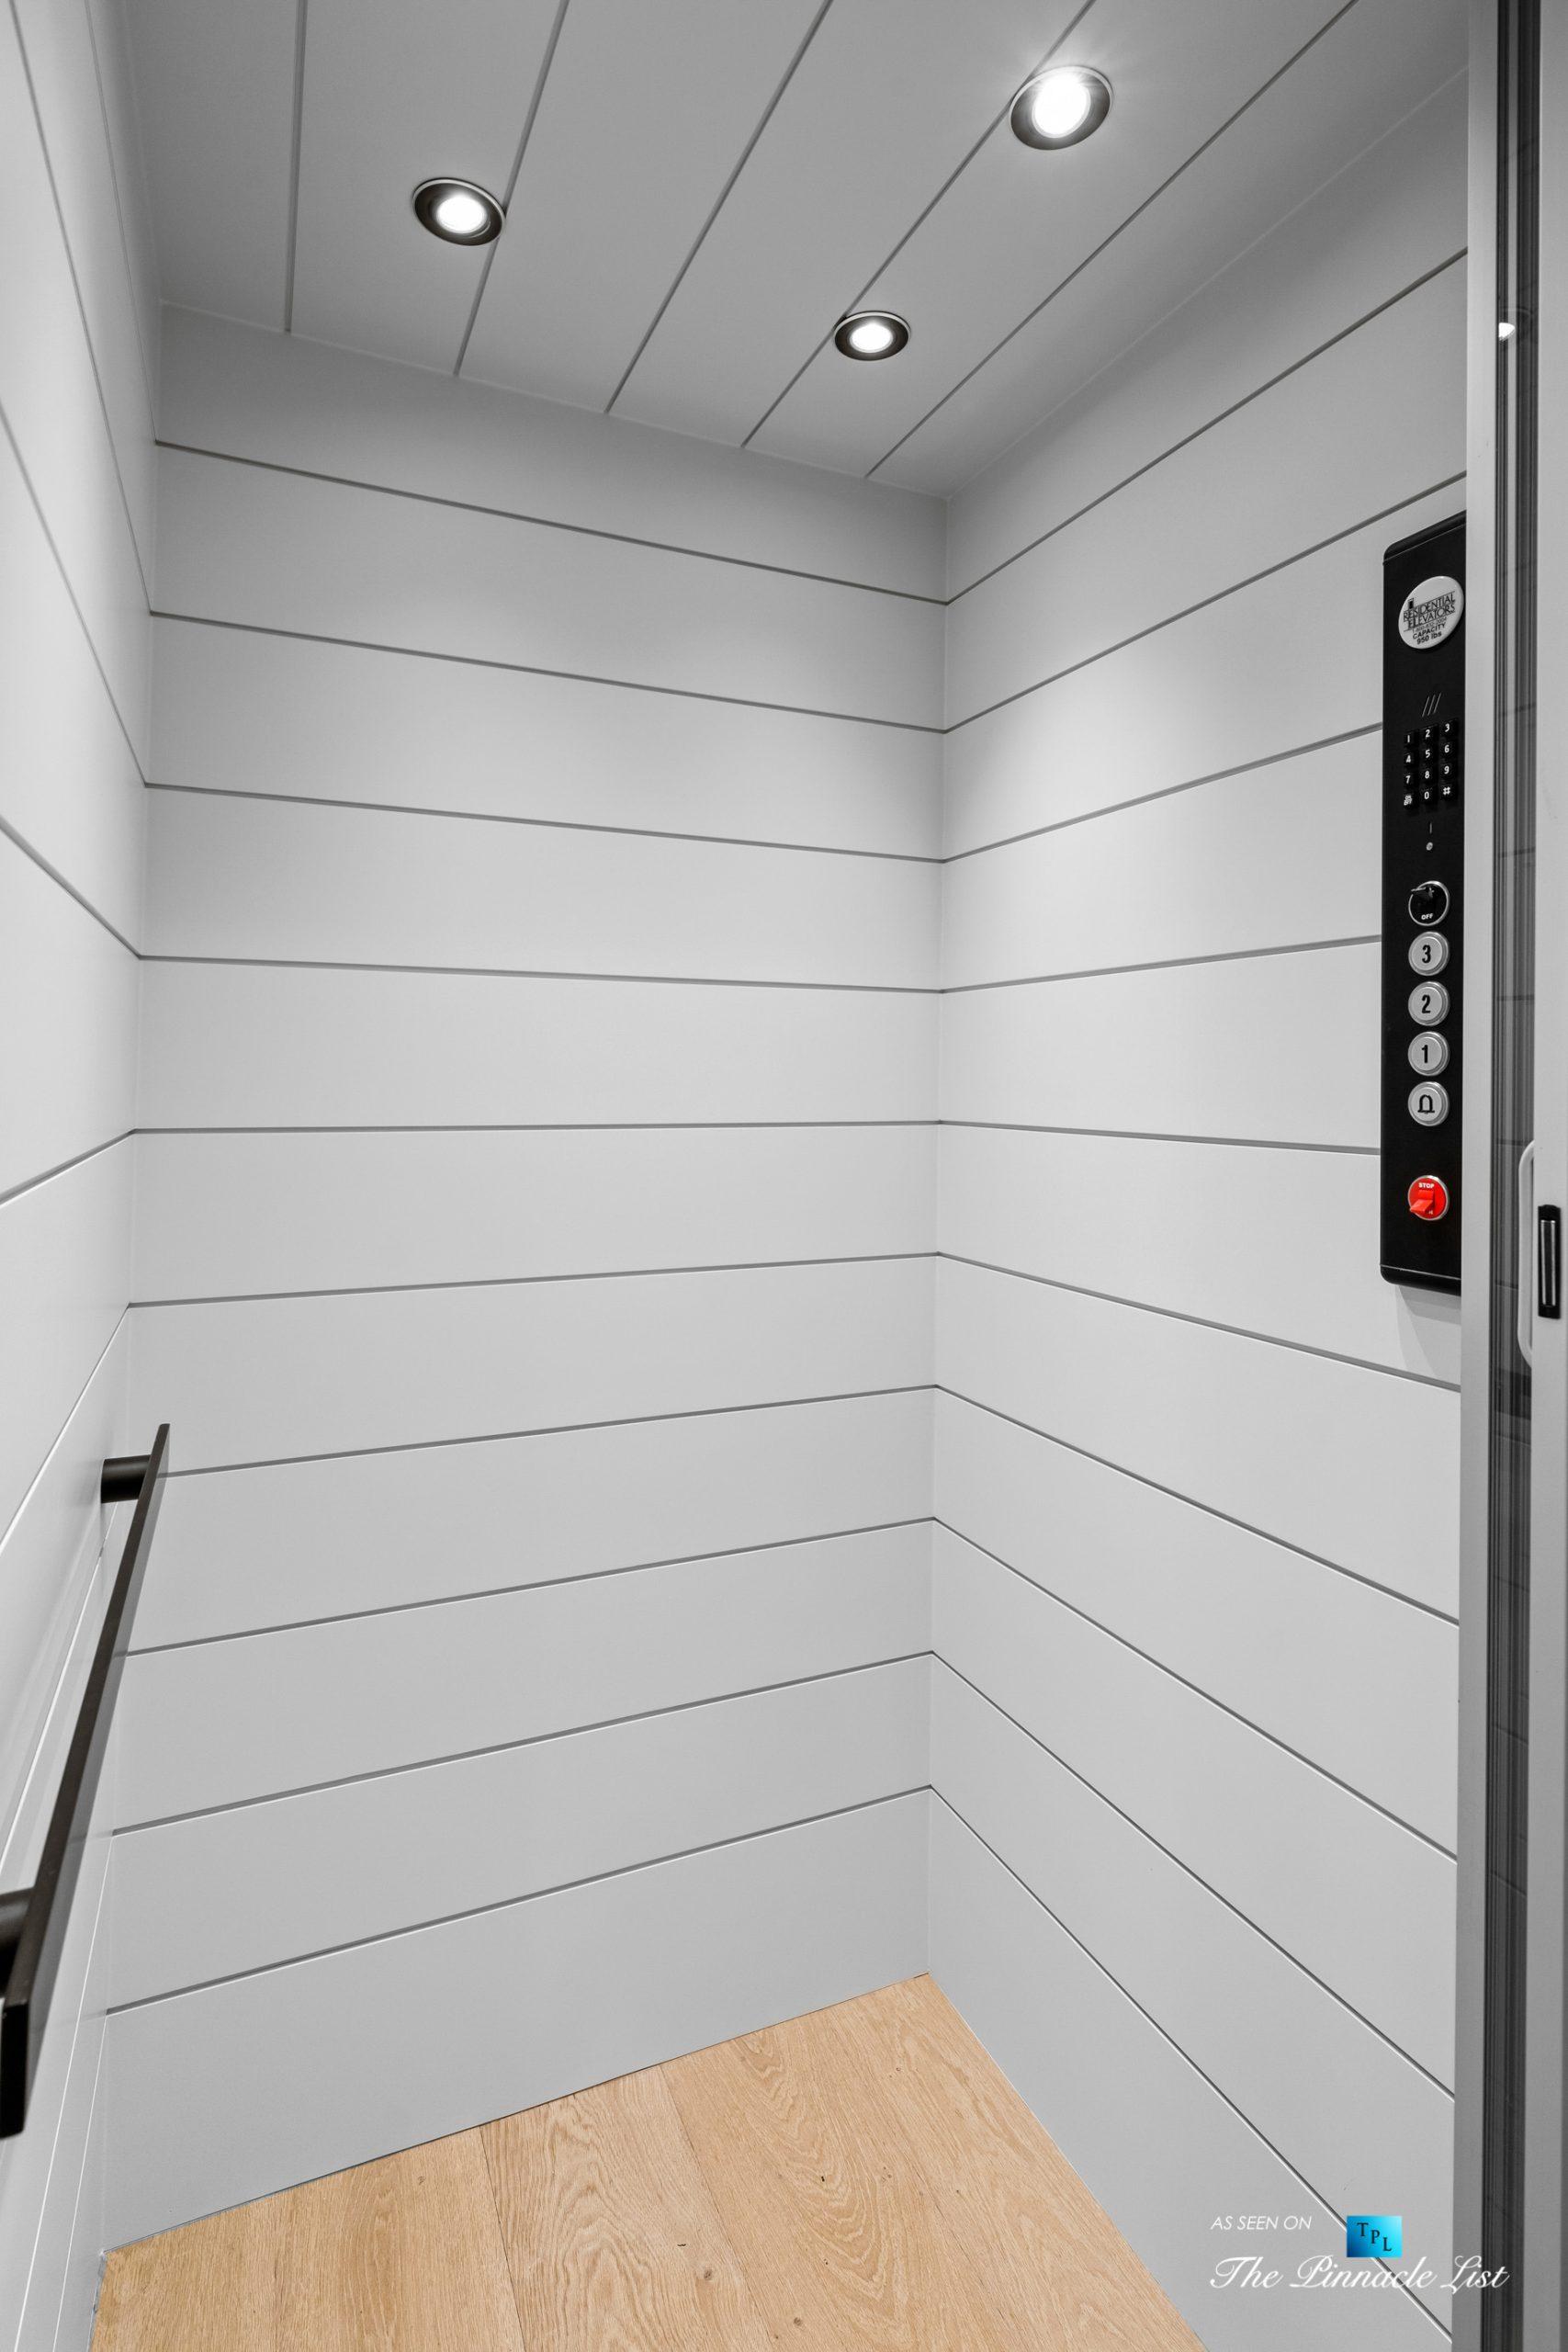 508 The Strand, Manhattan Beach, CA, USA – Private Elevator – Luxury Real Estate – Oceanfront Home